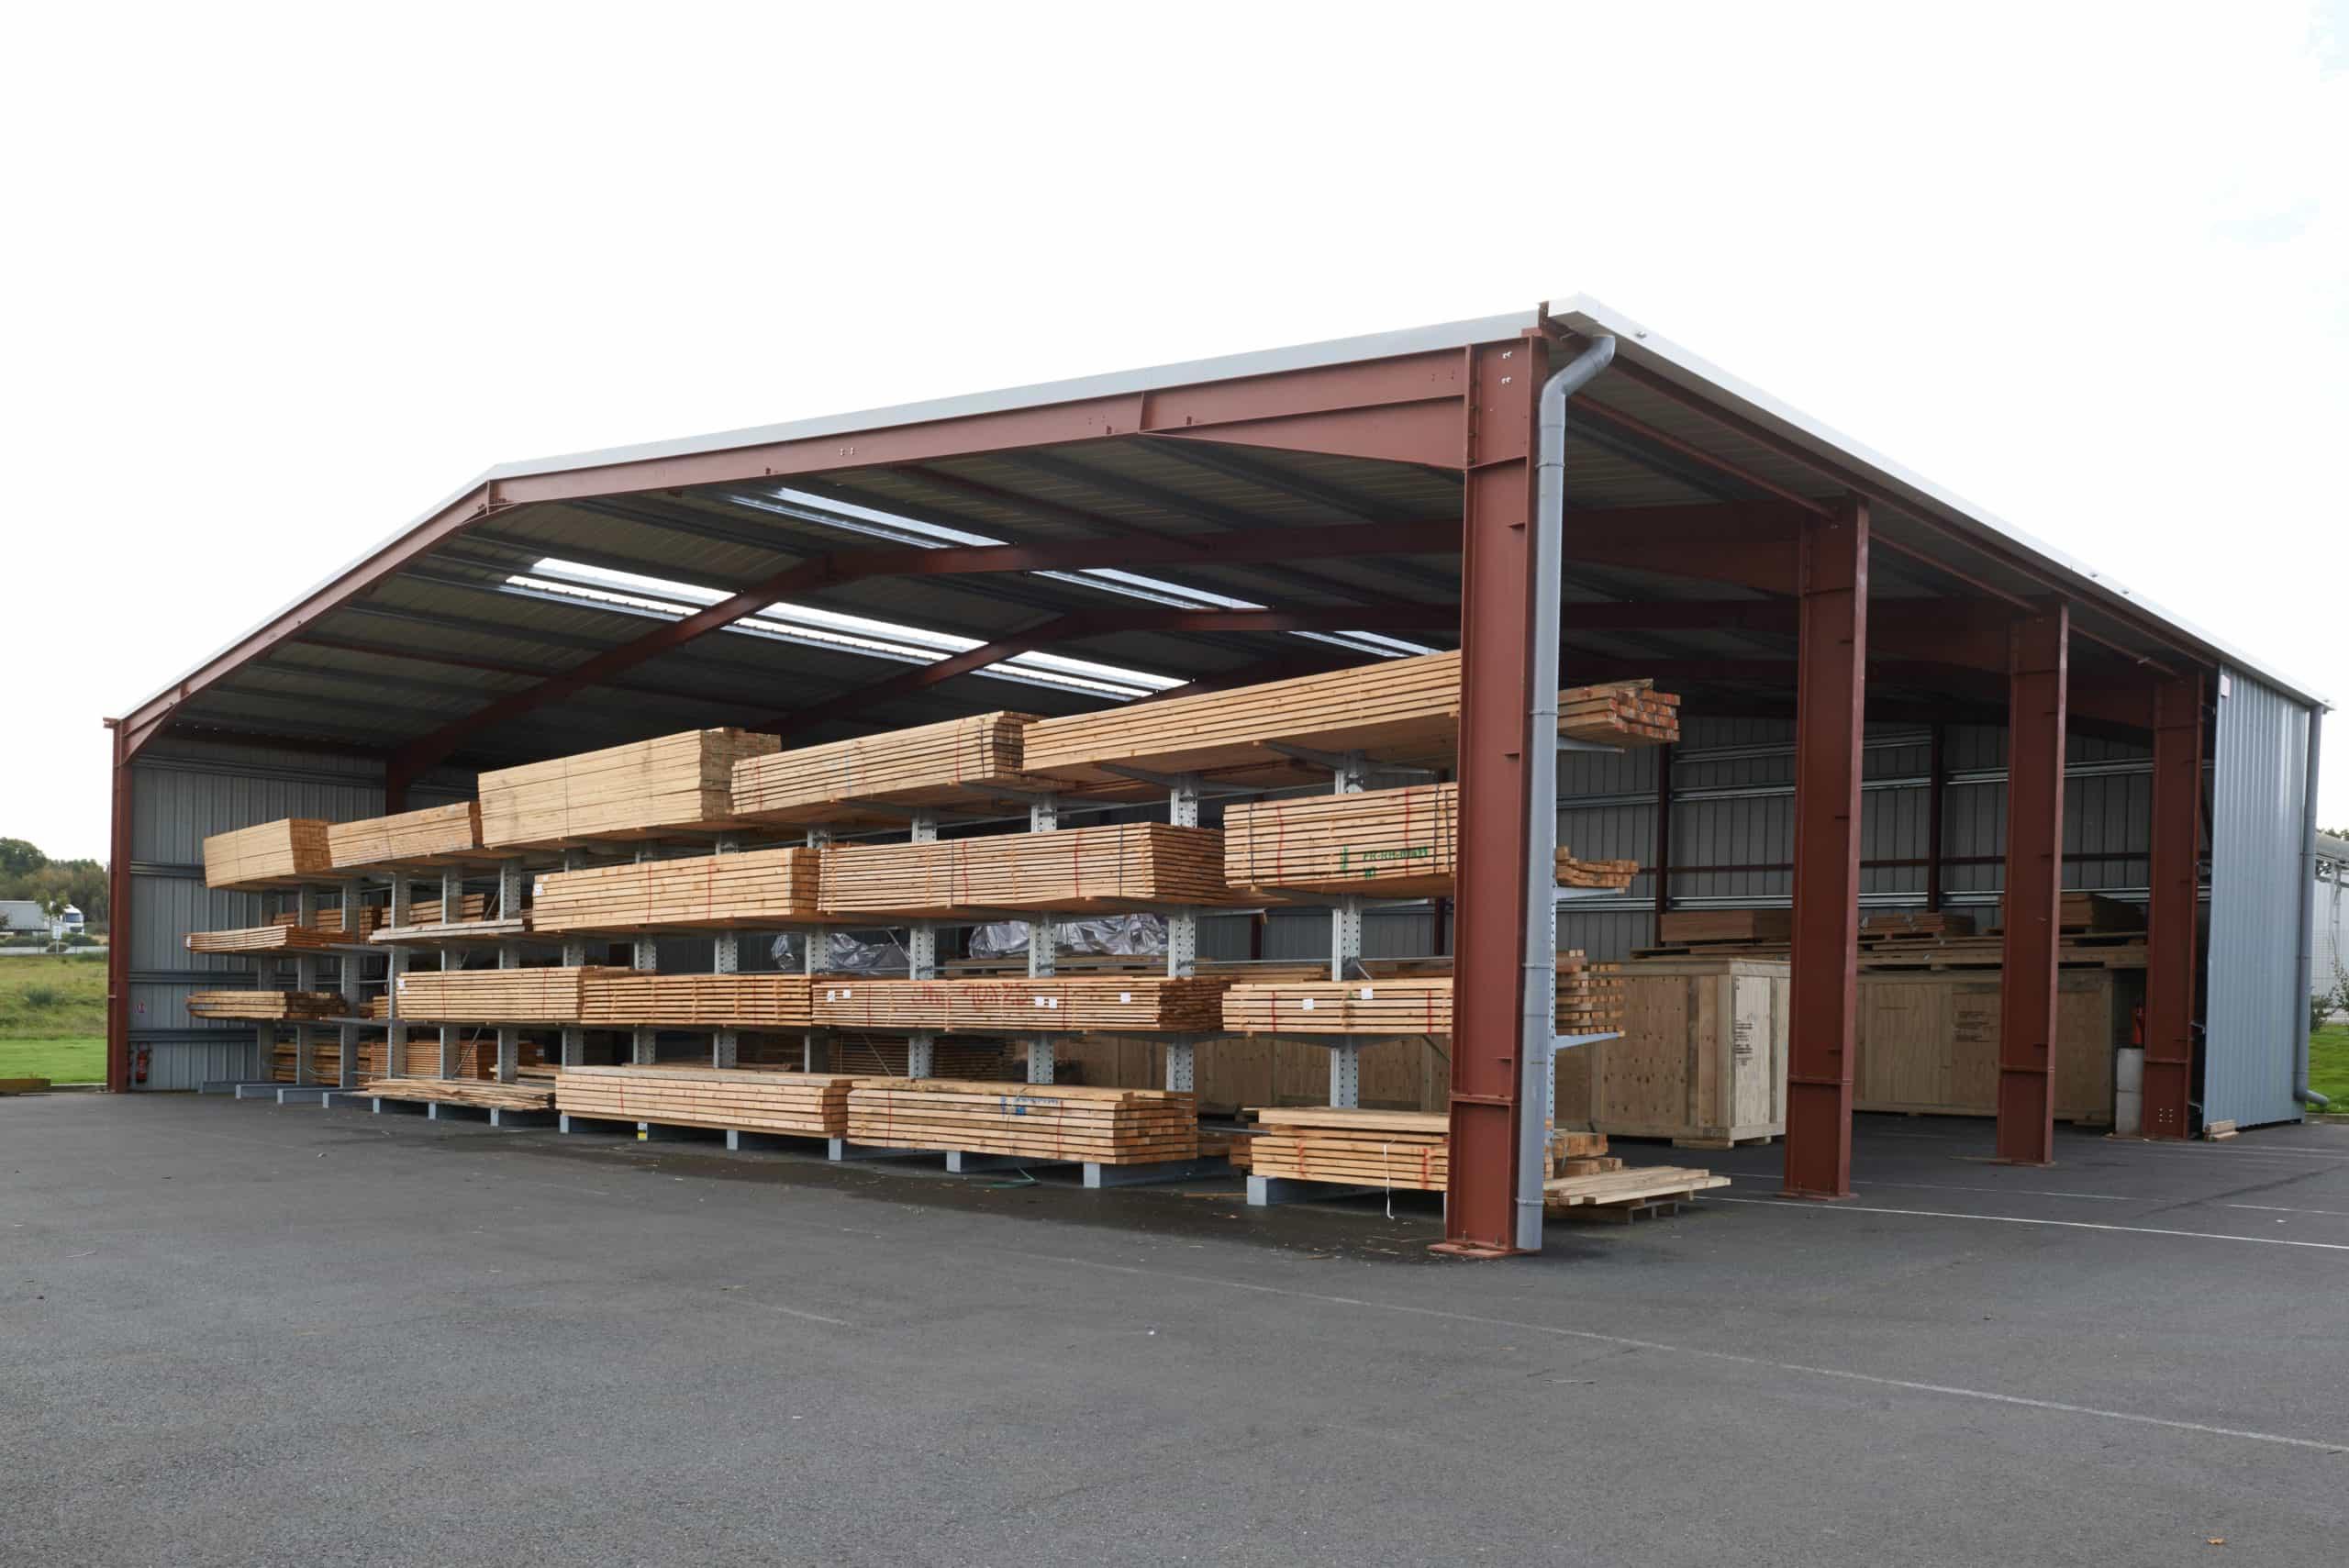 Hangar temporaire, 600m², location 48 mois